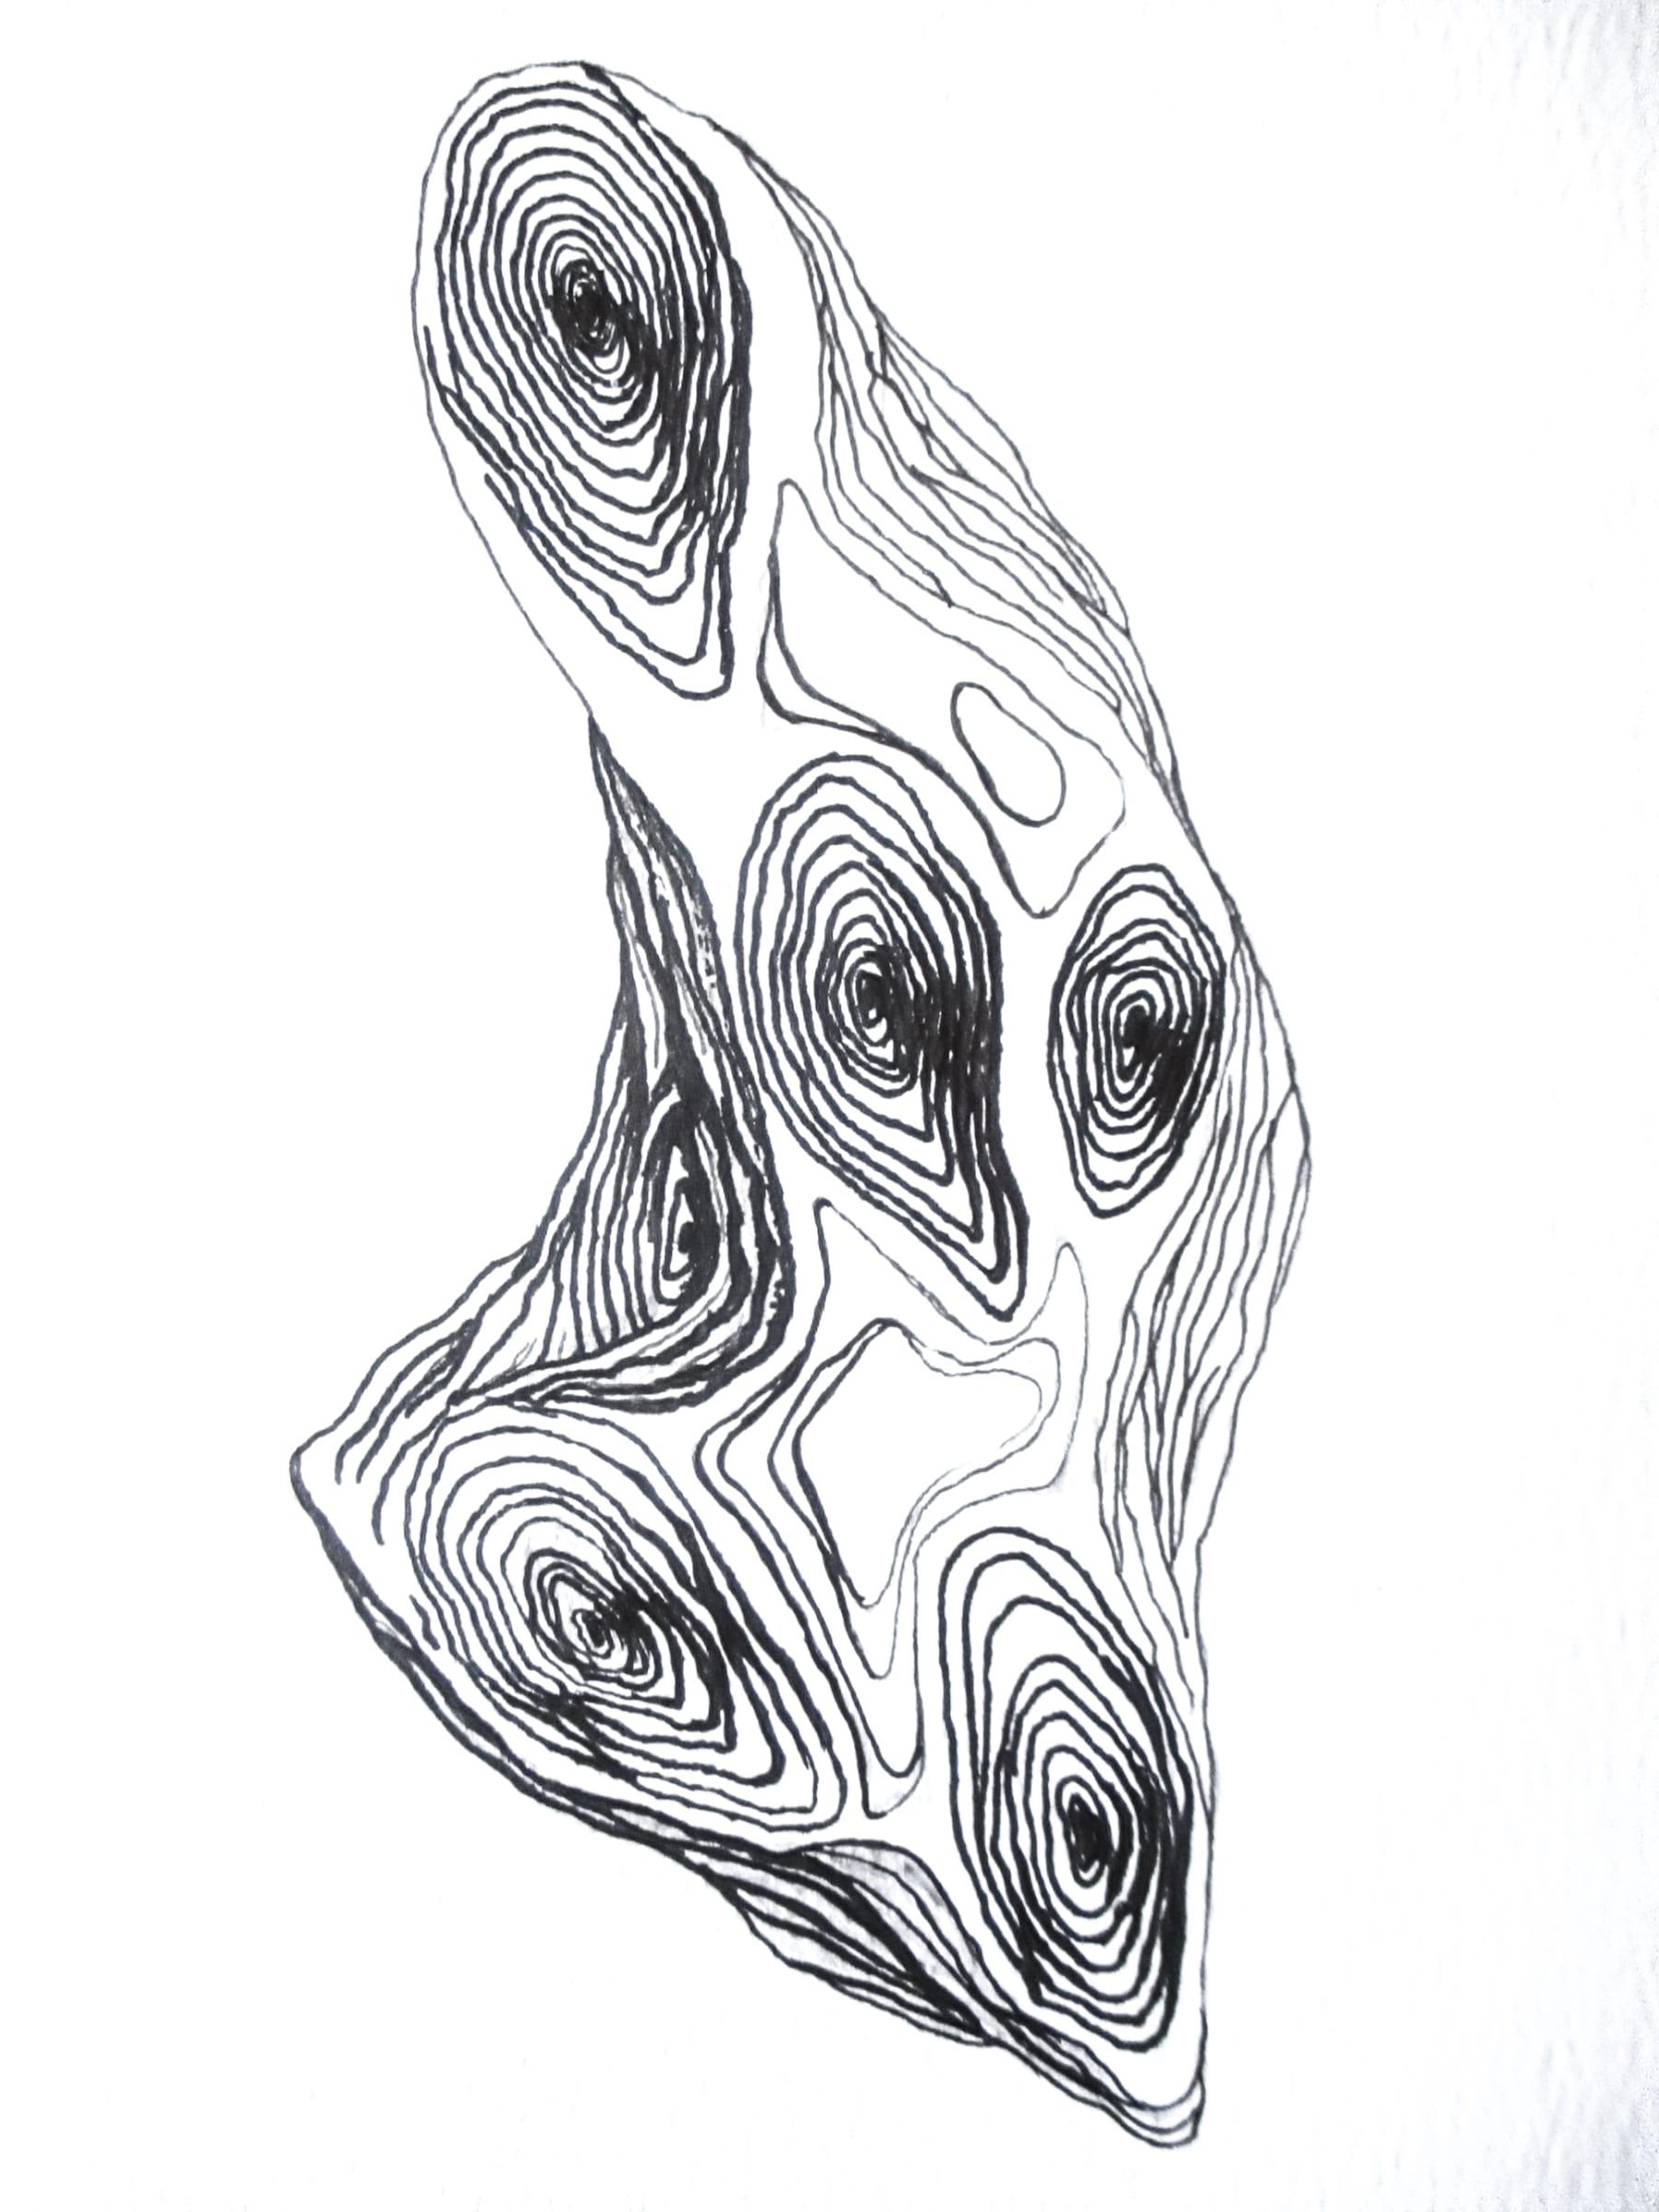 <span class=&#34;link fancybox-details-link&#34;><a href=&#34;/content/viewing-room/54/artworks2307/&#34;>View Detail Page</a></span><div class=&#34;medium&#34;>Ink On Watercolour Paper</div> <div class=&#34;dimensions&#34;>21cm x 14.8cm</div>